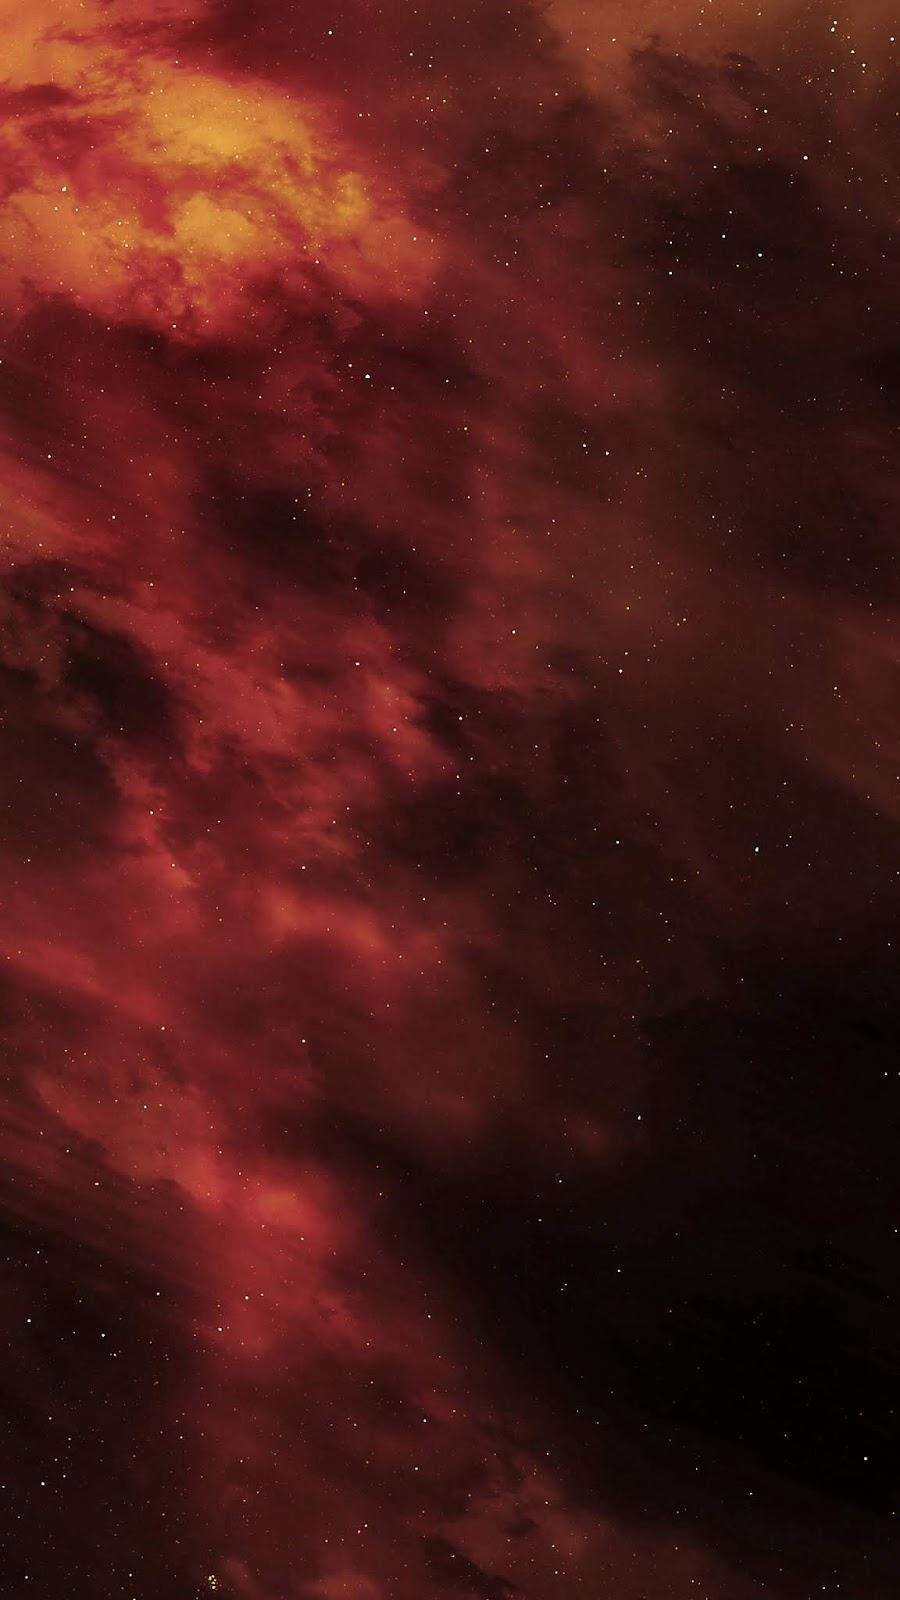 Redish Nebula